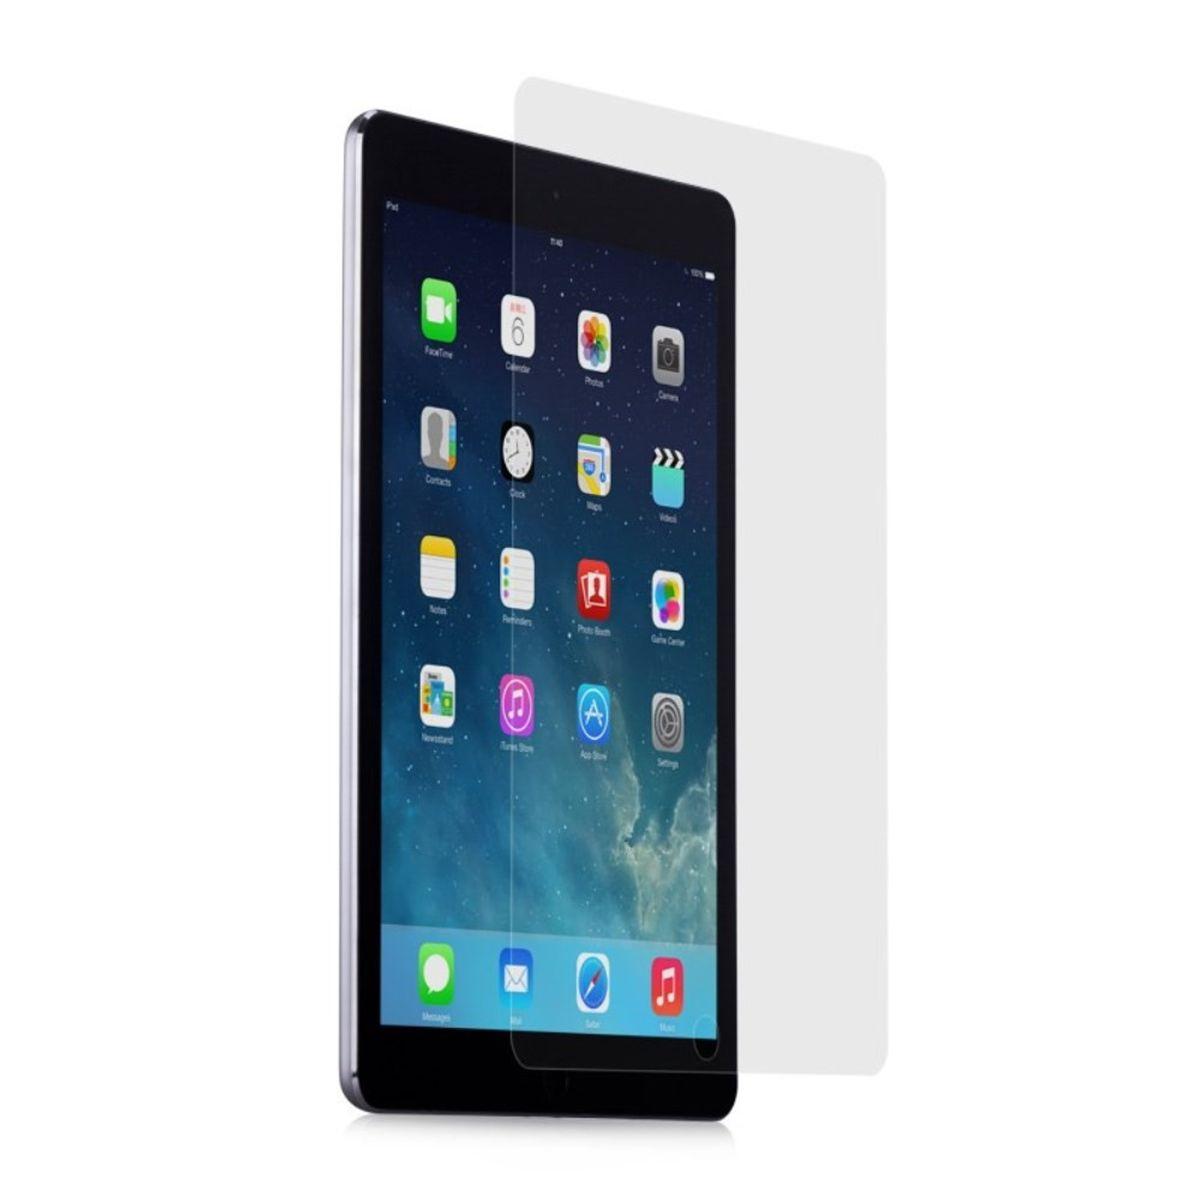 Apple iPad Air / iPad Air 2 Displayschutzfolie 9H Verbundglas Panzer Schutz Glas Tempered Glas